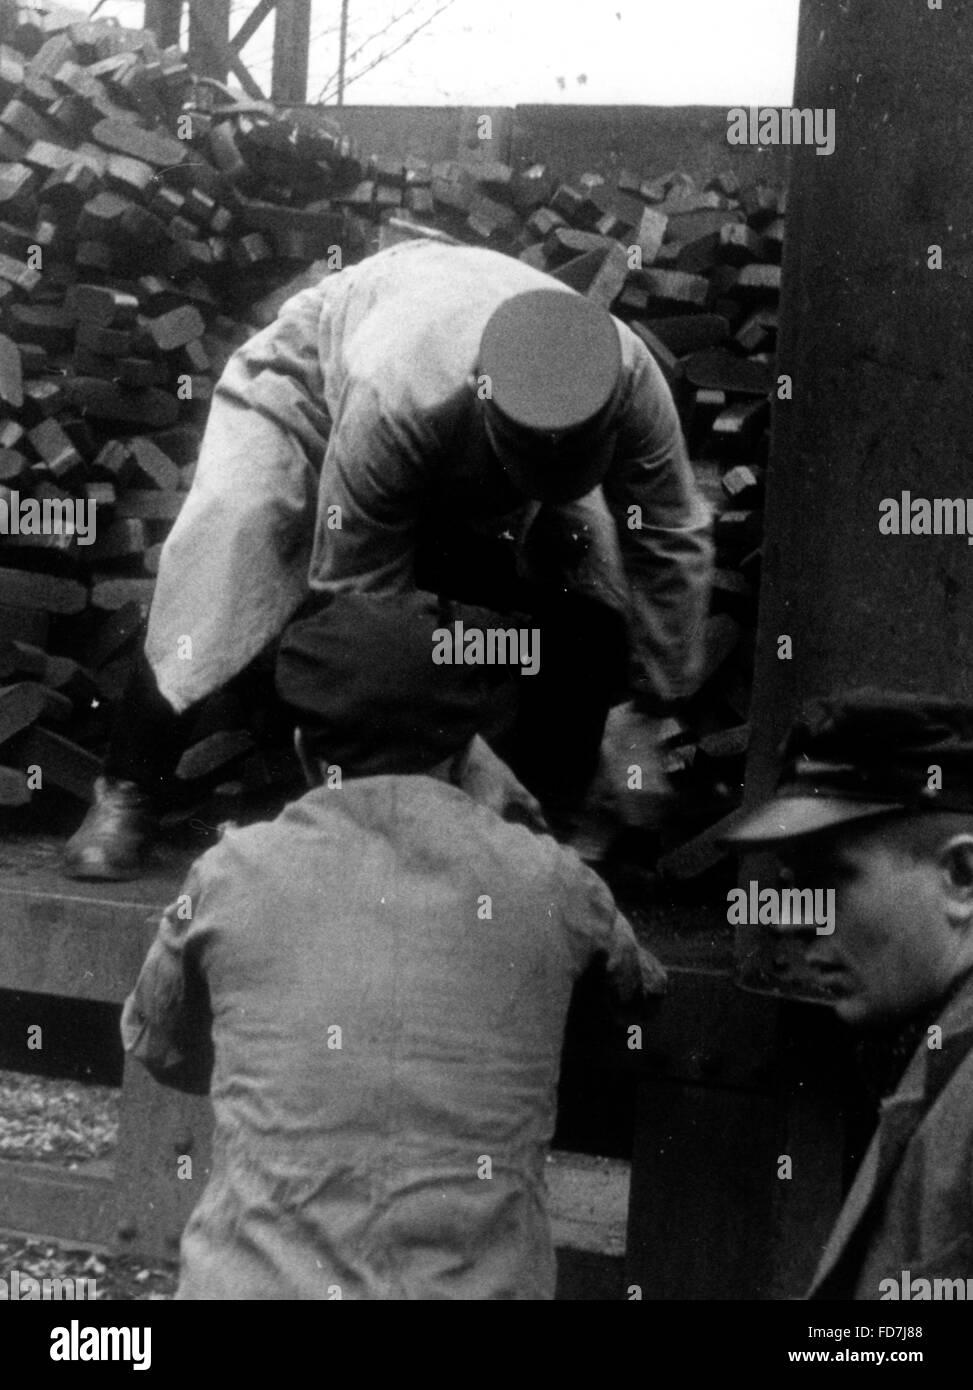 Political leader transporting coal, 1939 - Stock Image